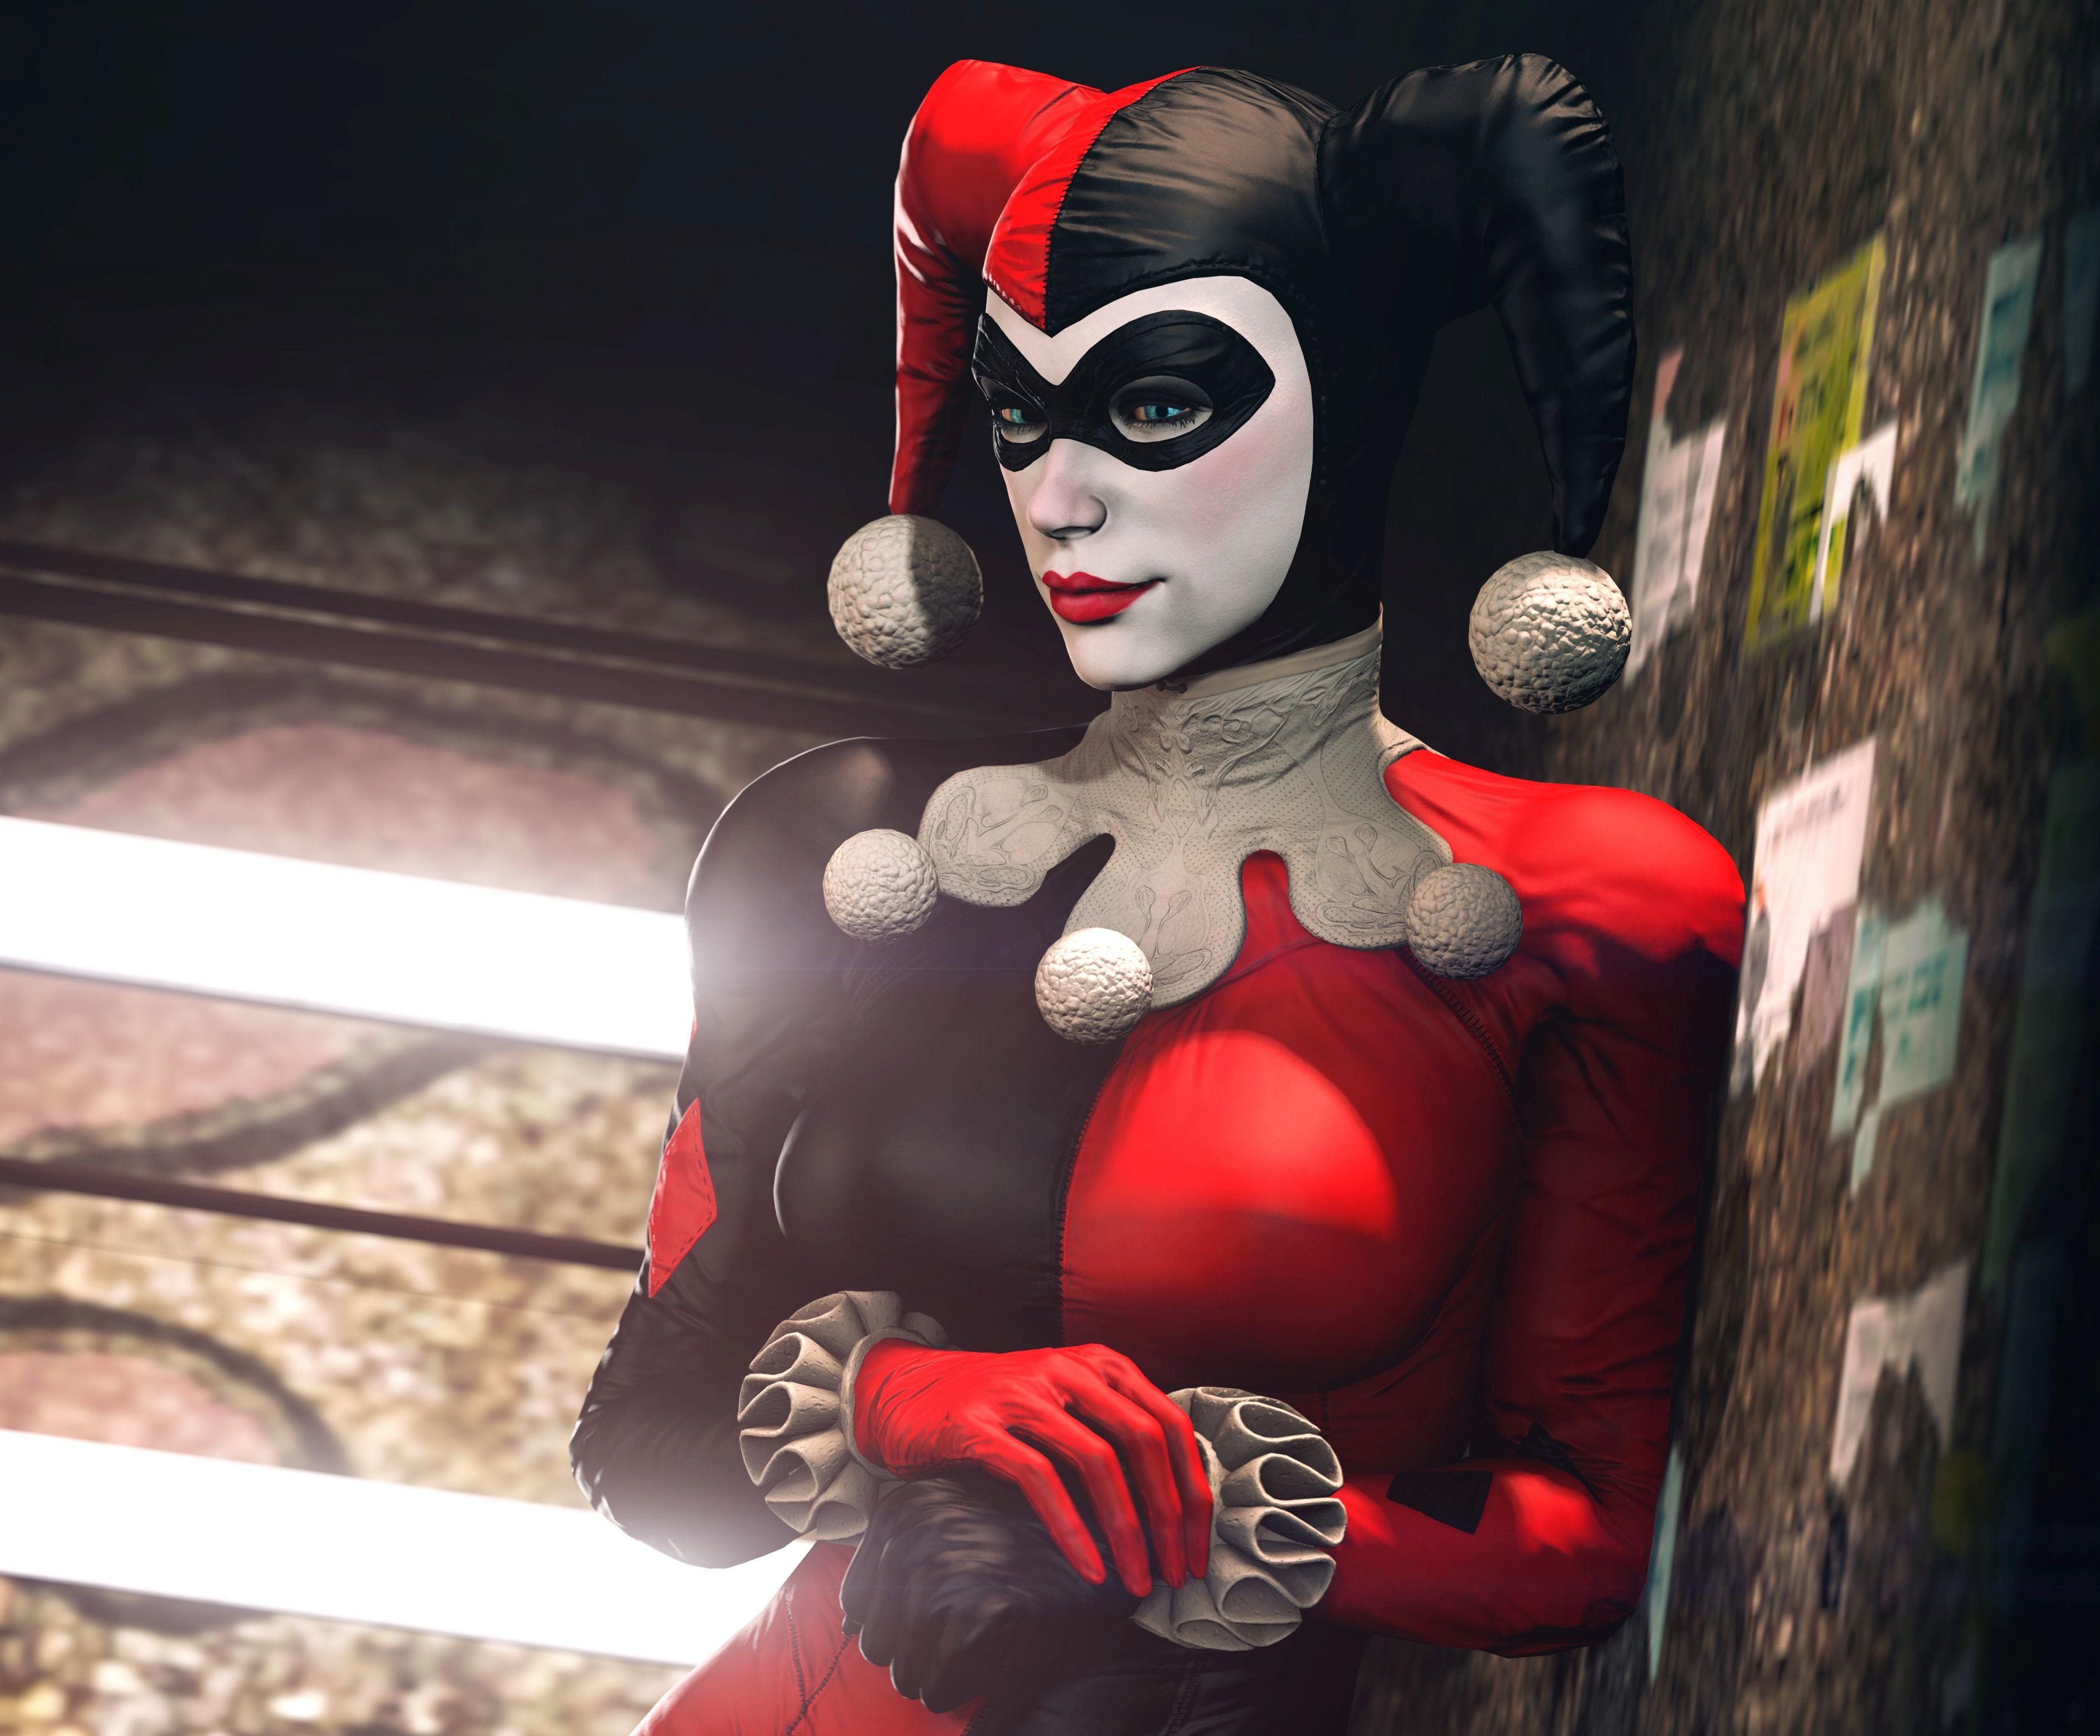 Harley Quinn Batman Arkham Night, HD Games, 4k Wallpapers